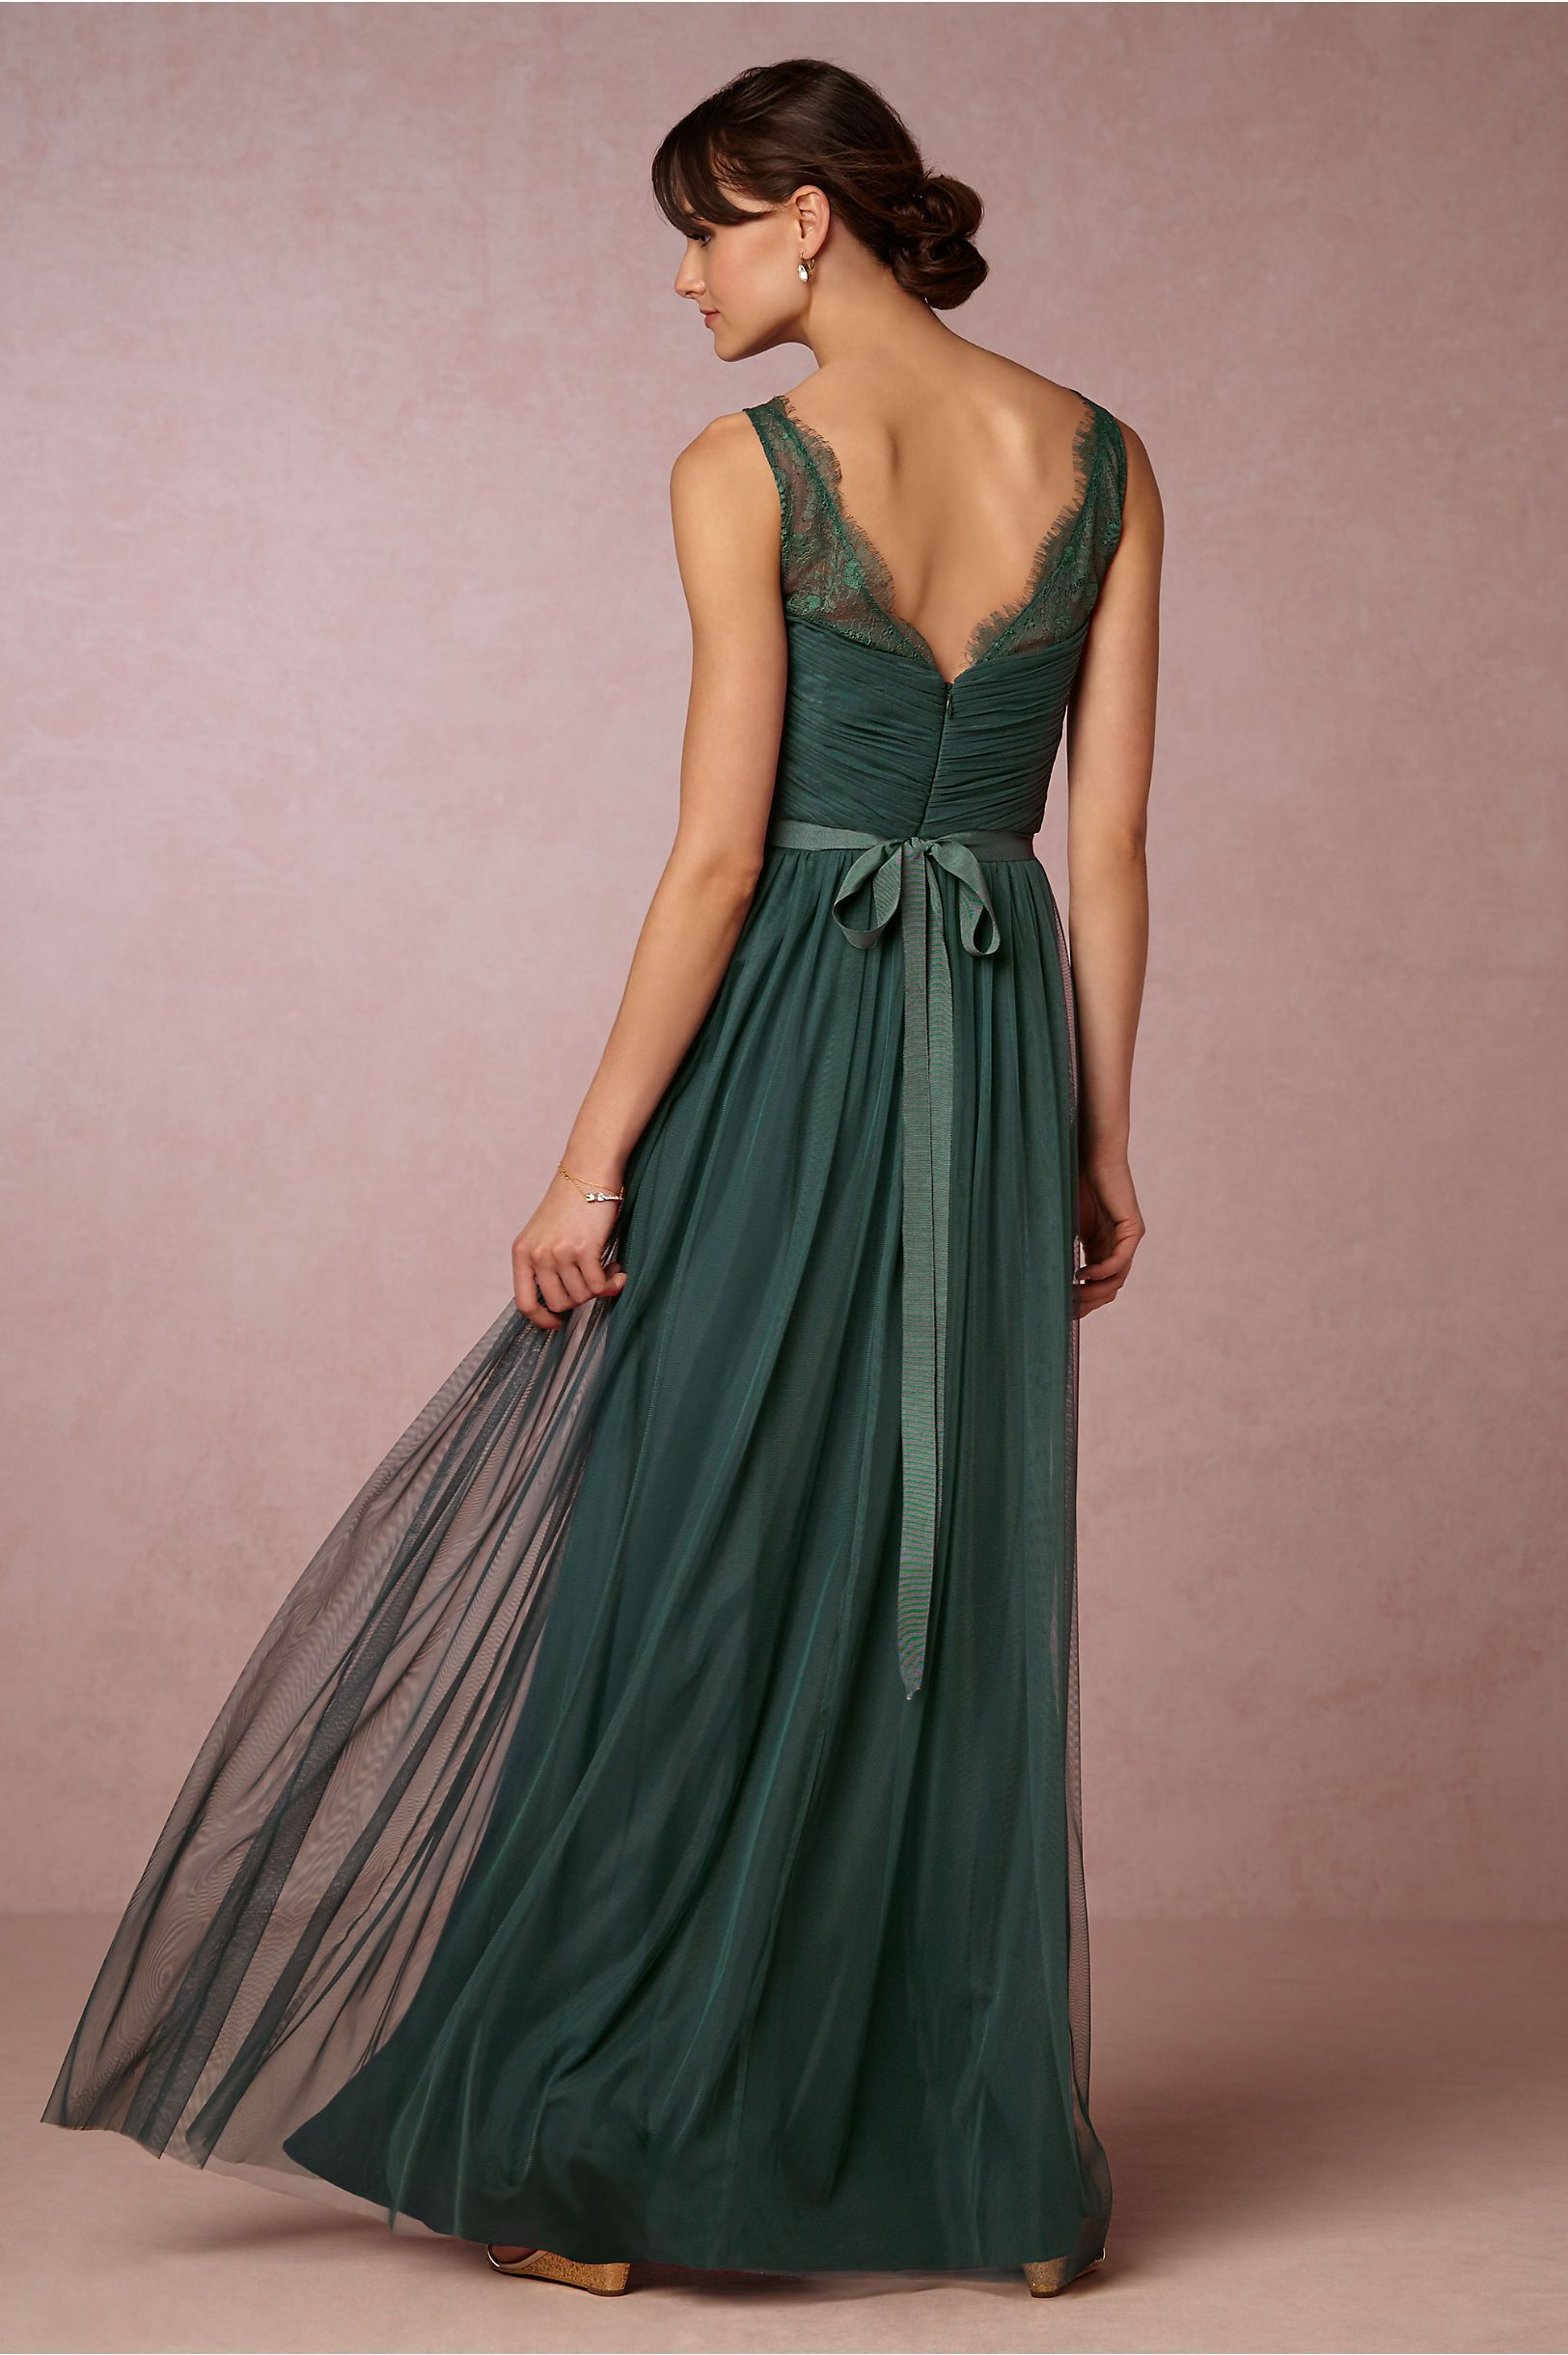 55d14207567cef emerald green bridesmaid dress | Fleur Dress from BHLDN | Fall ...